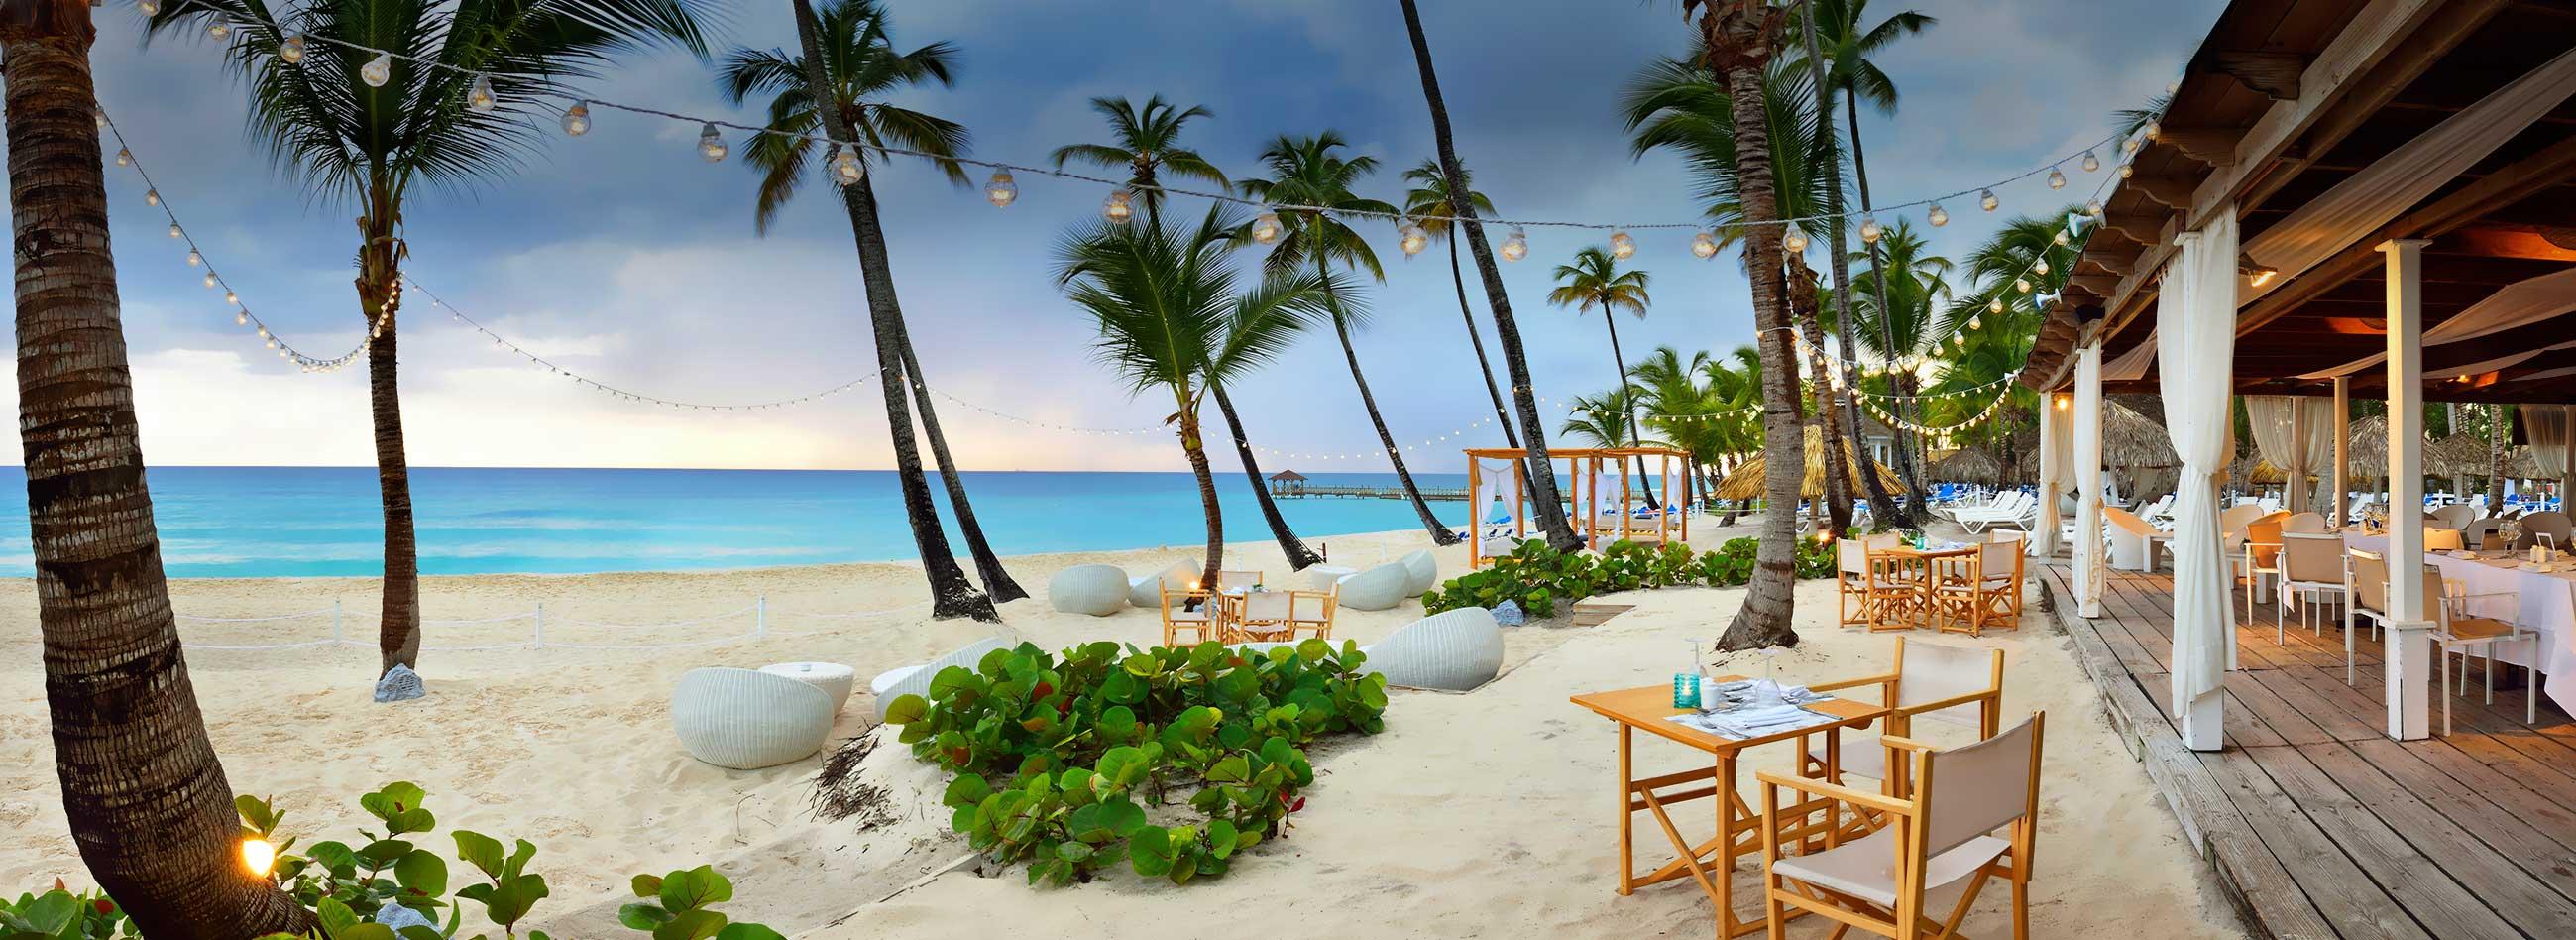 4-vacaciones-caribe-hoteles-catalonia